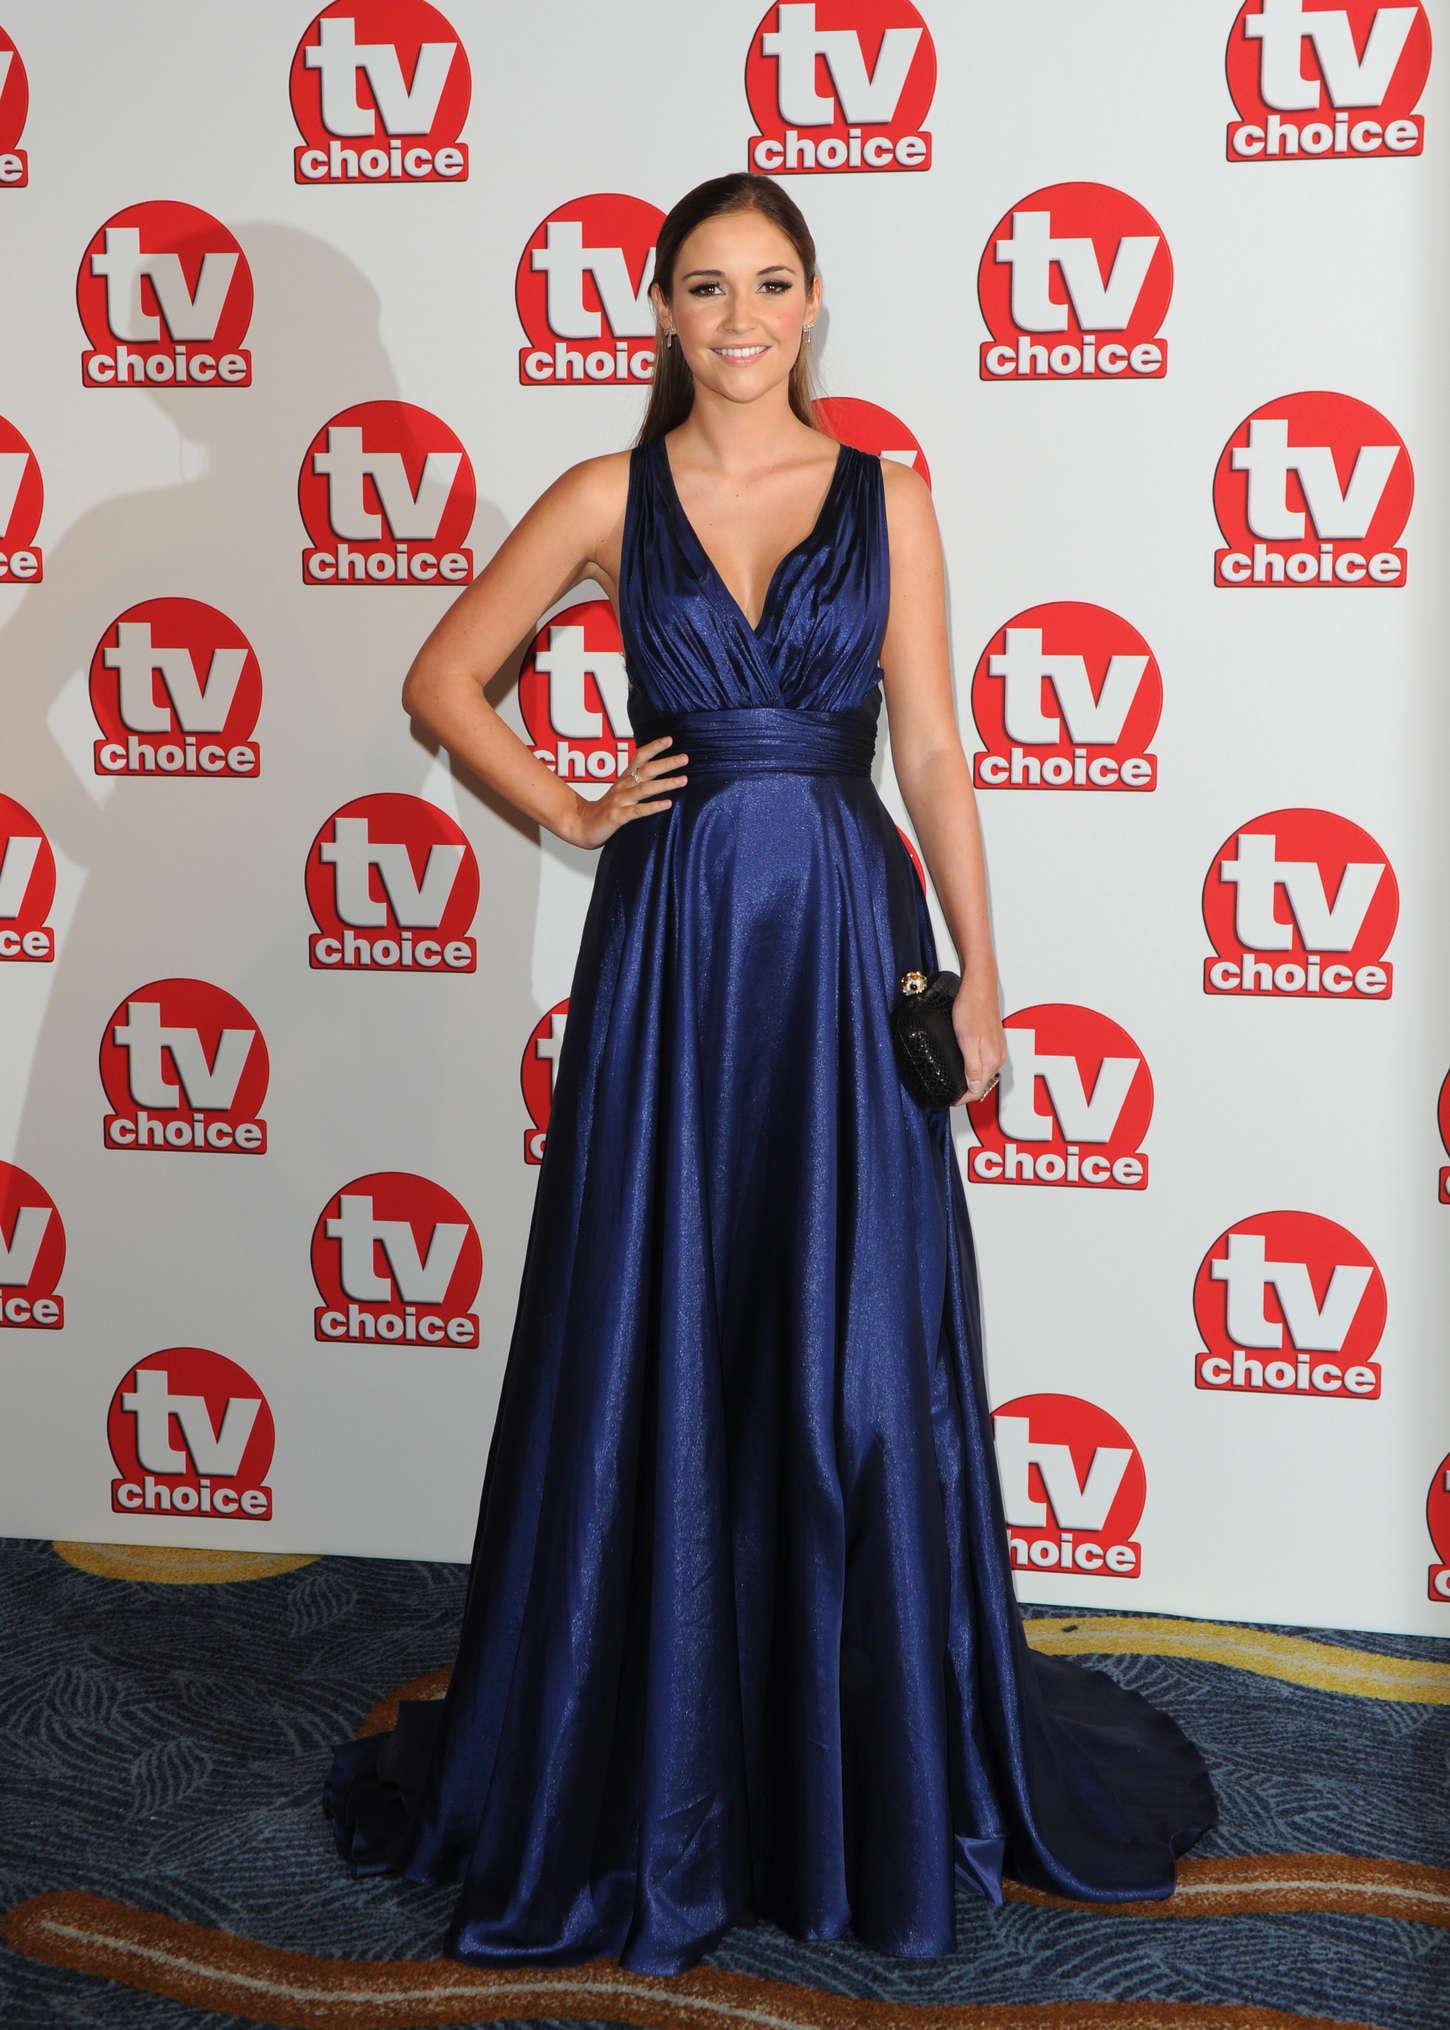 Jacqueline Jossa TV Choice Awards in London